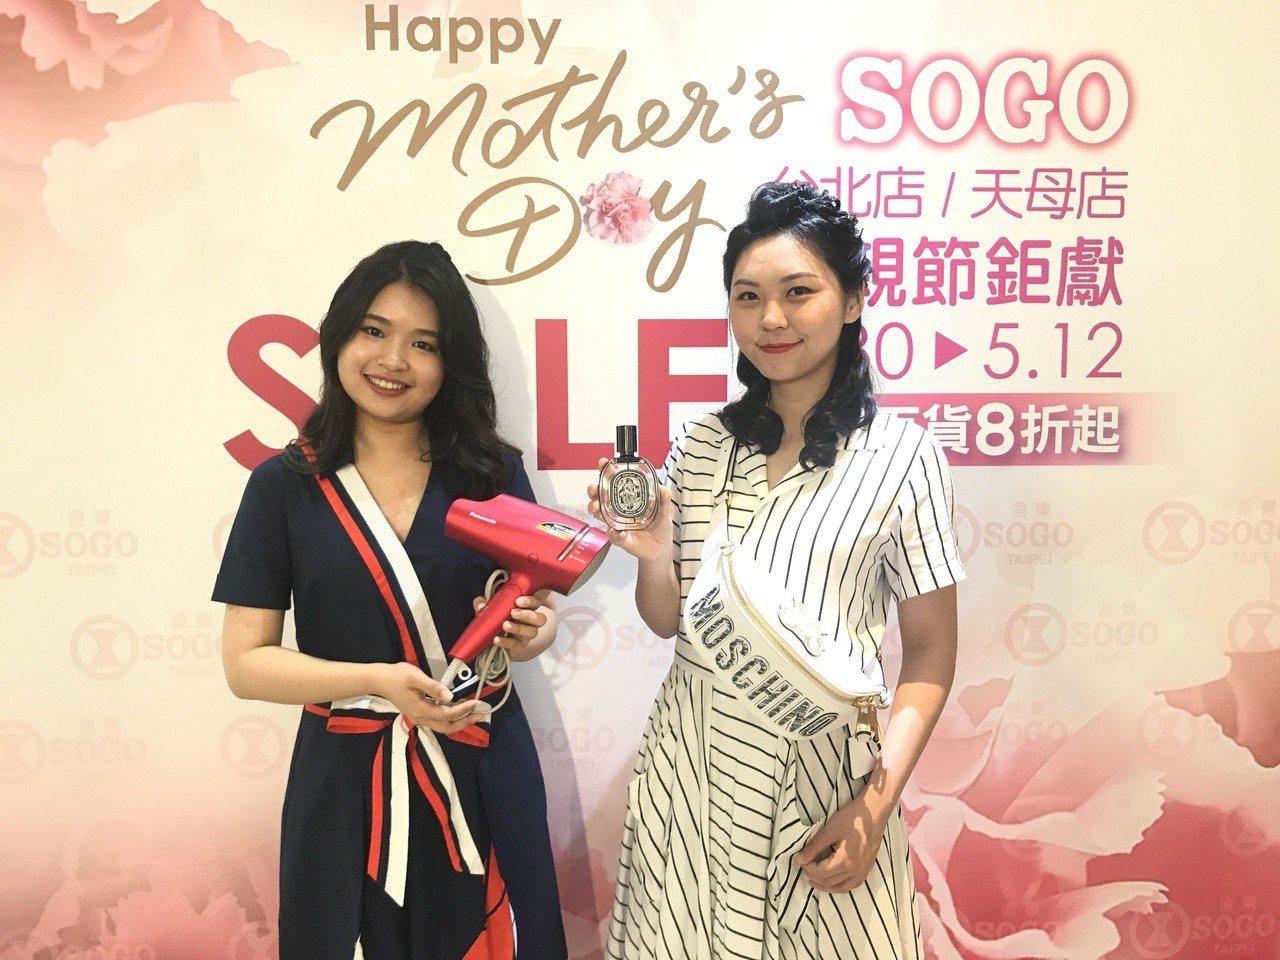 SOGO台北店母親節檔期,小家電32年來首度推出滿5千送5百。圖/SOGO提供